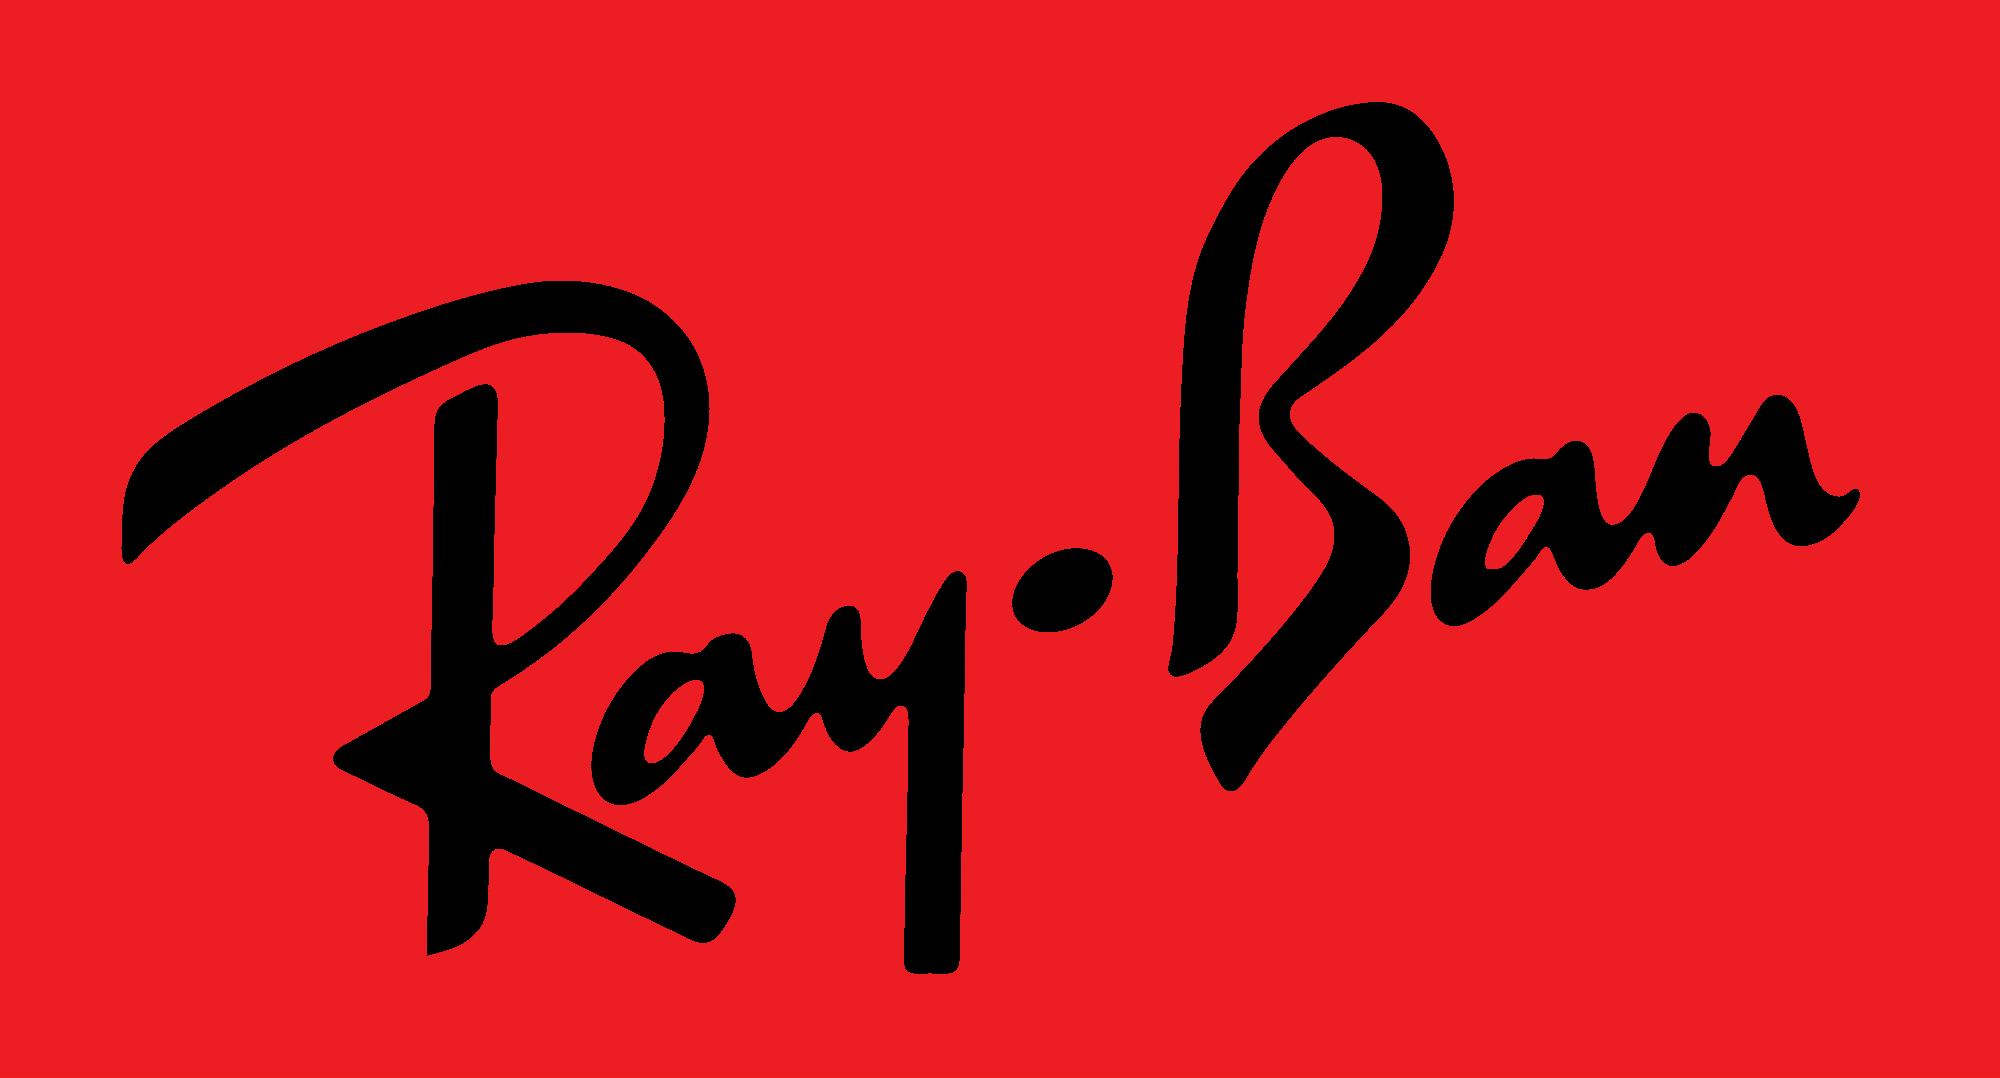 Ray-Ban Iconic Fashion Logos